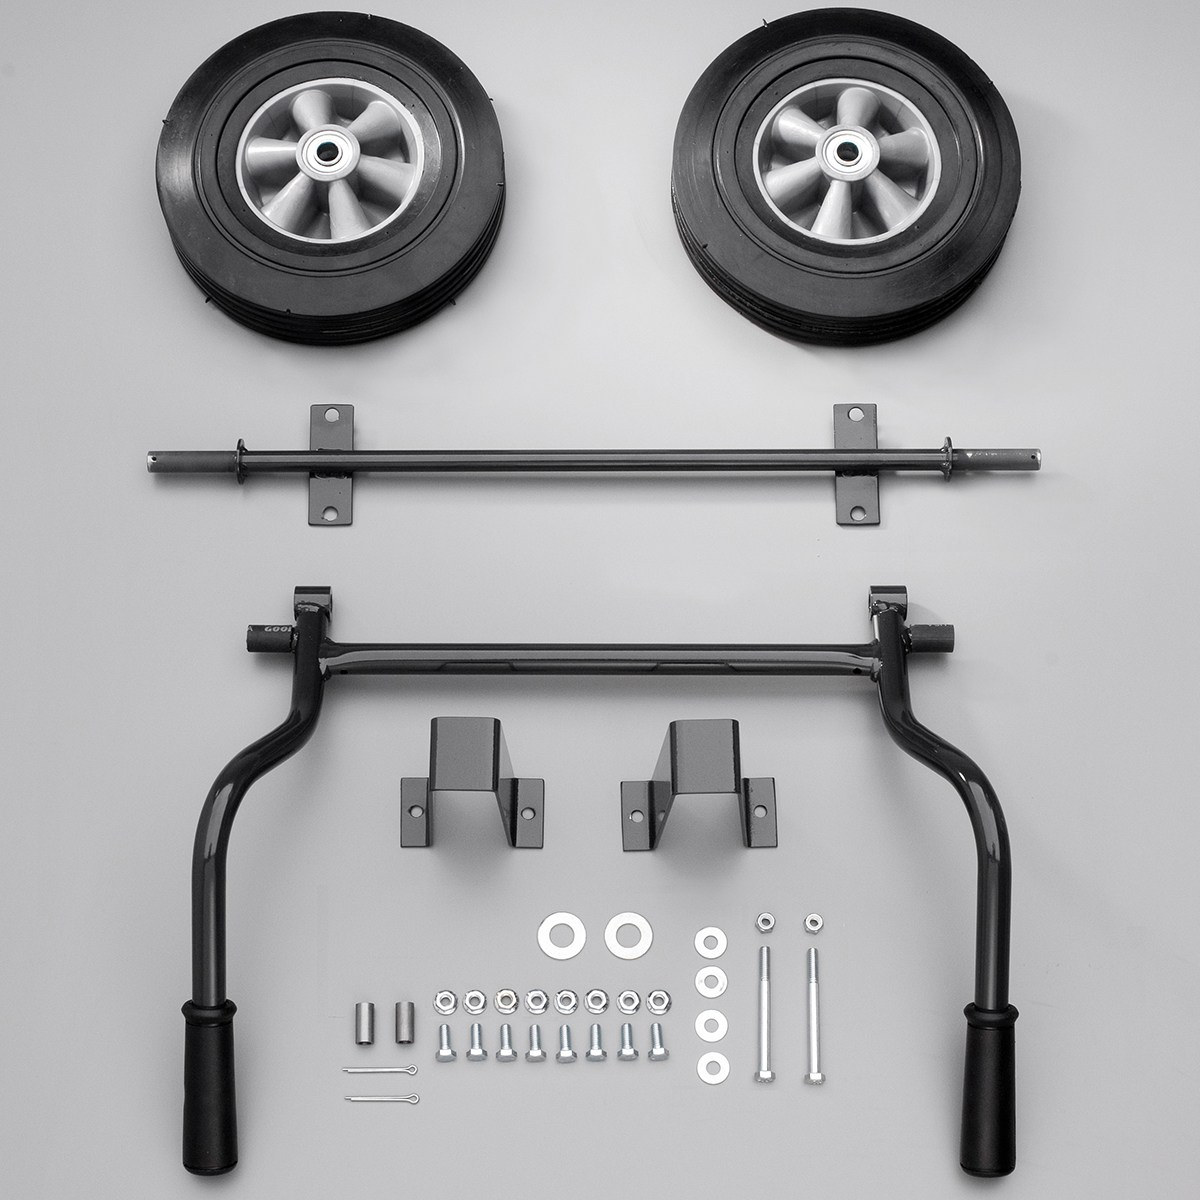 Yamaha EF4000-6600DE Wheel Kit